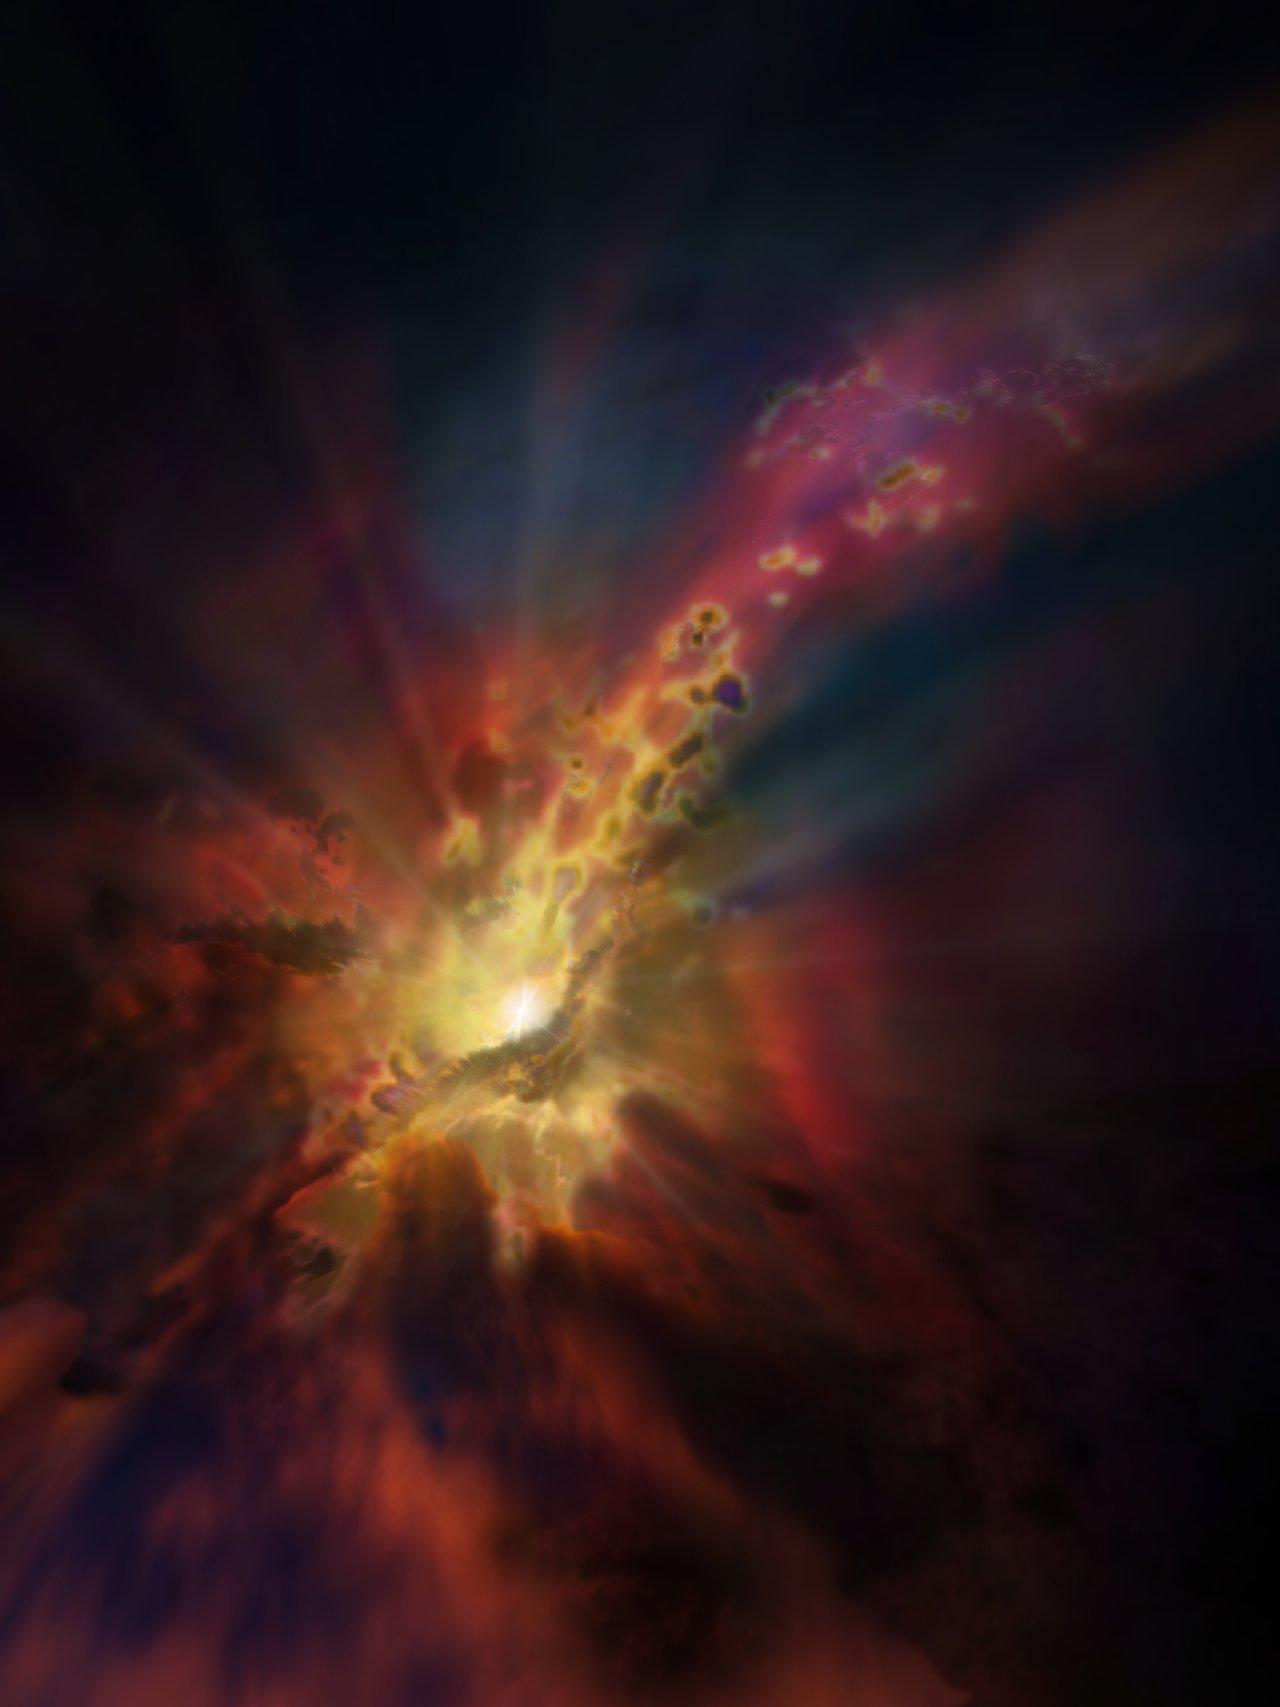 Monster Black Hole Caught Feeding On Clumpy, Cloudy 'Rain'